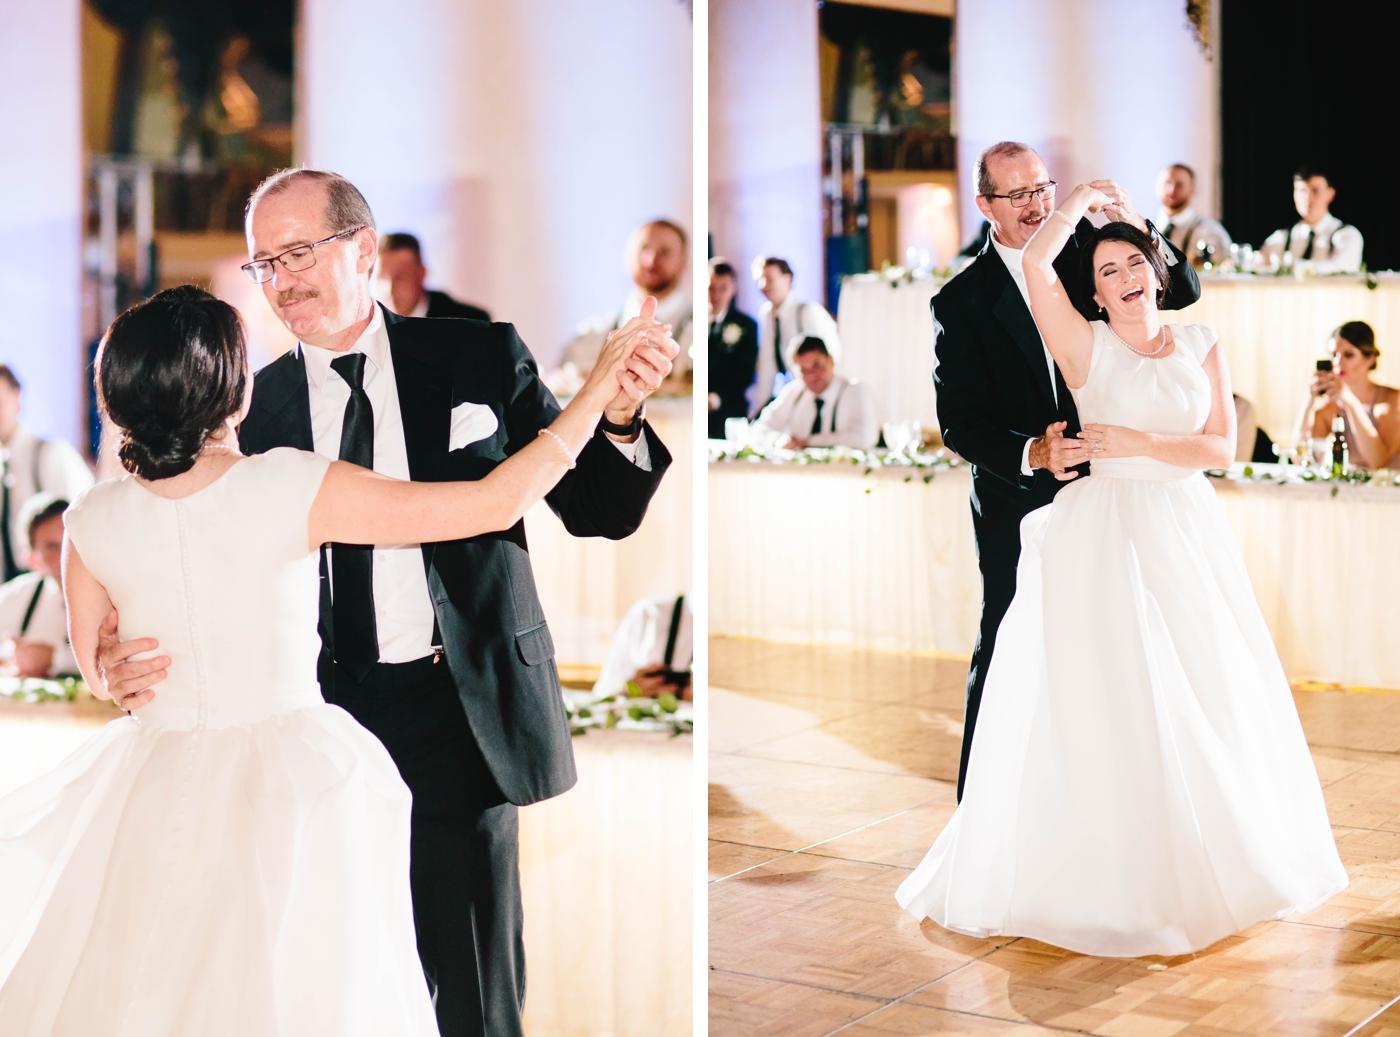 chicago-fine-art-wedding-photography-mccarthy66